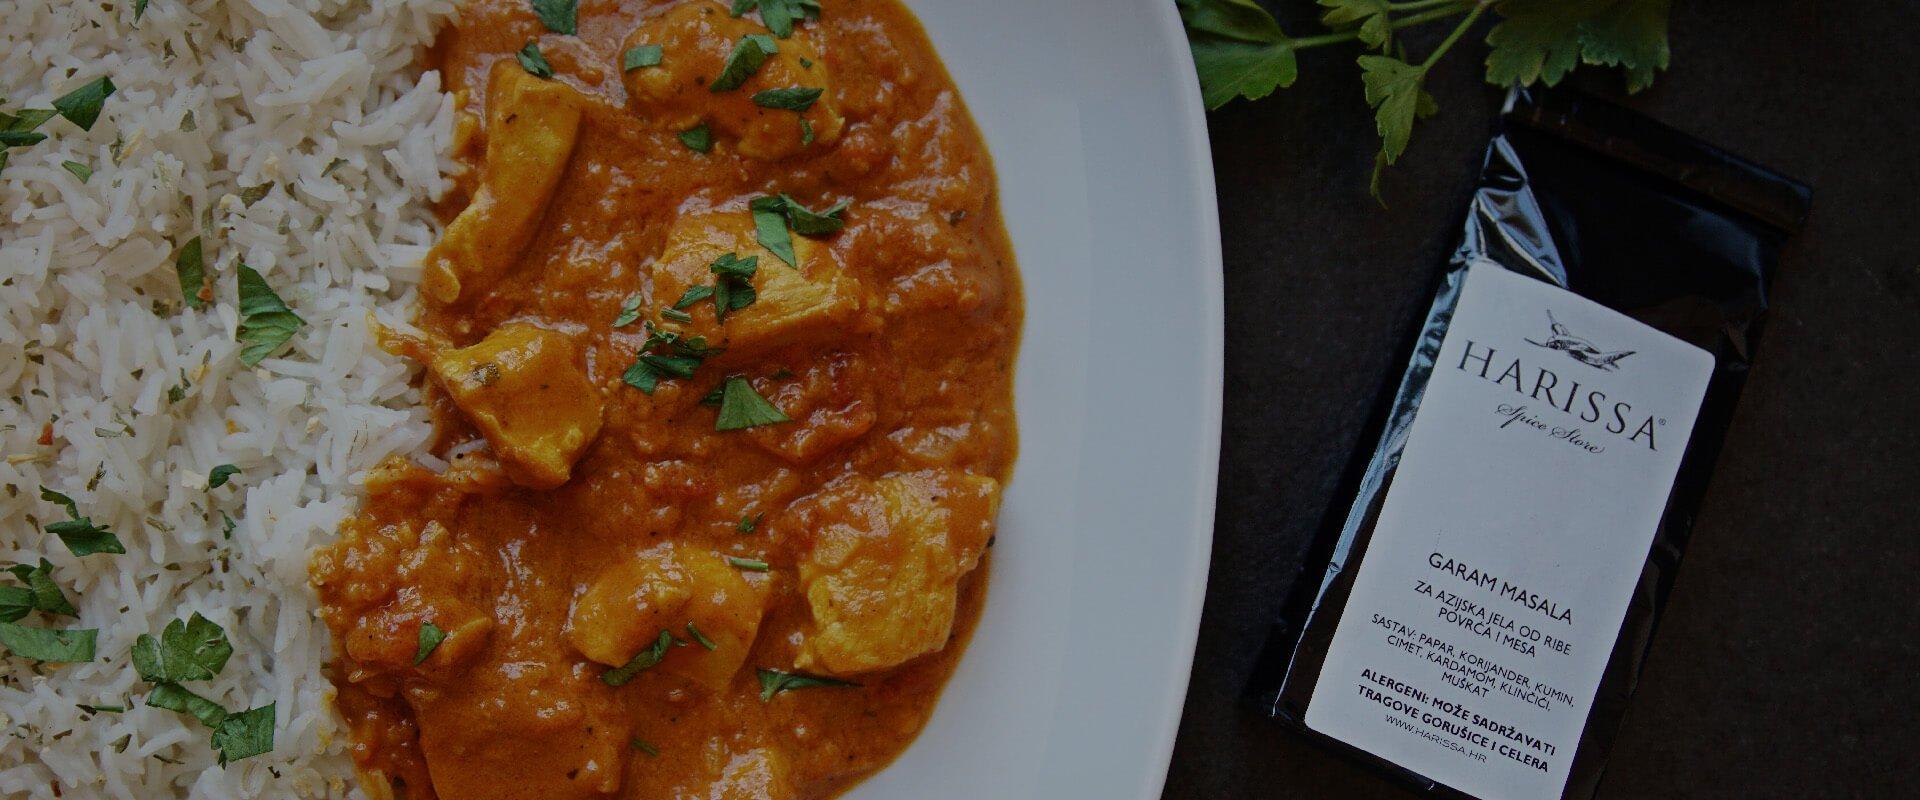 Article-hero-image-curry chicken.jpg